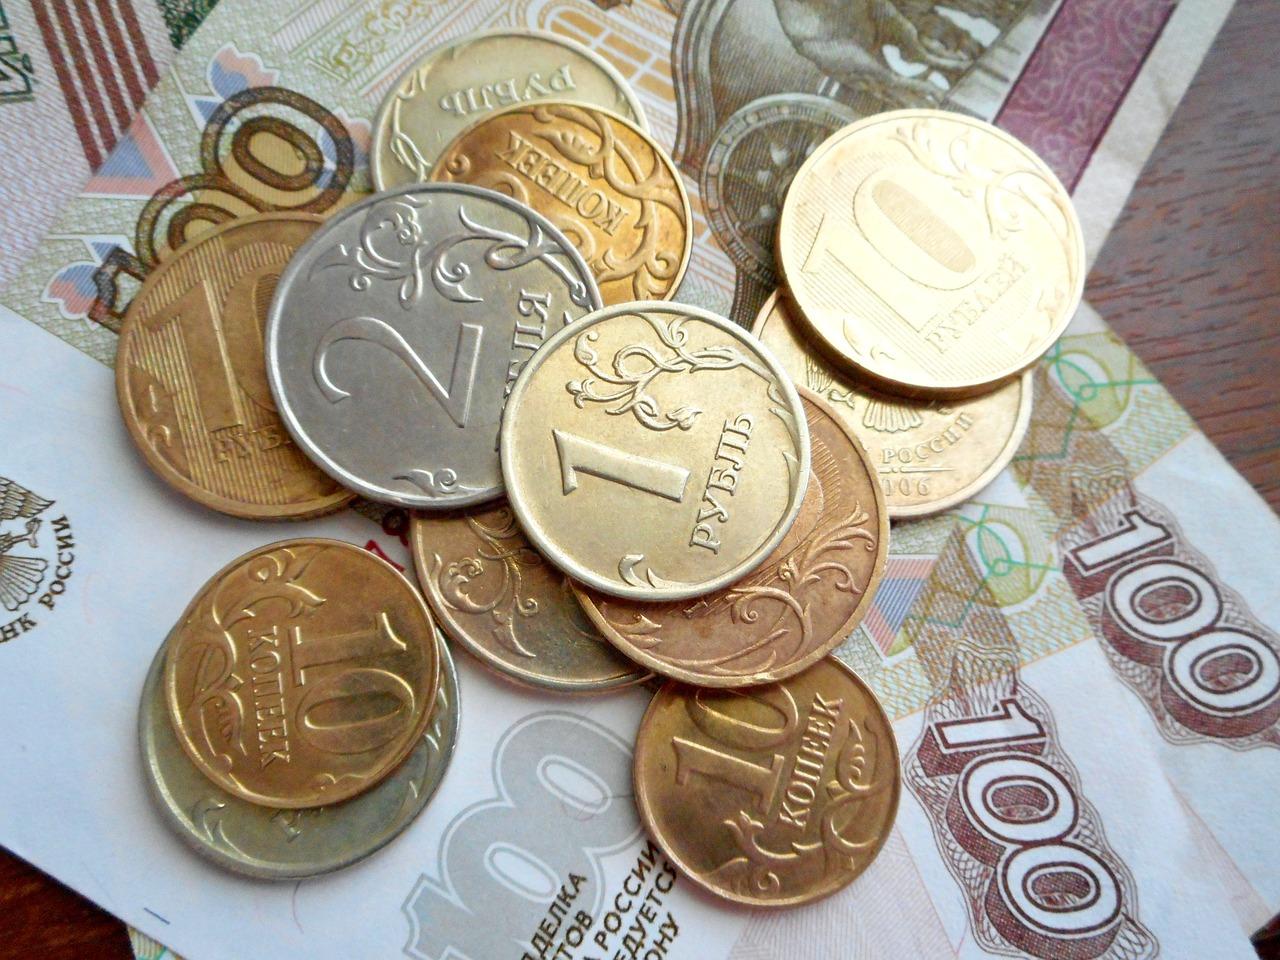 Астраханские предприниматели получили 600 млн рублей от государства